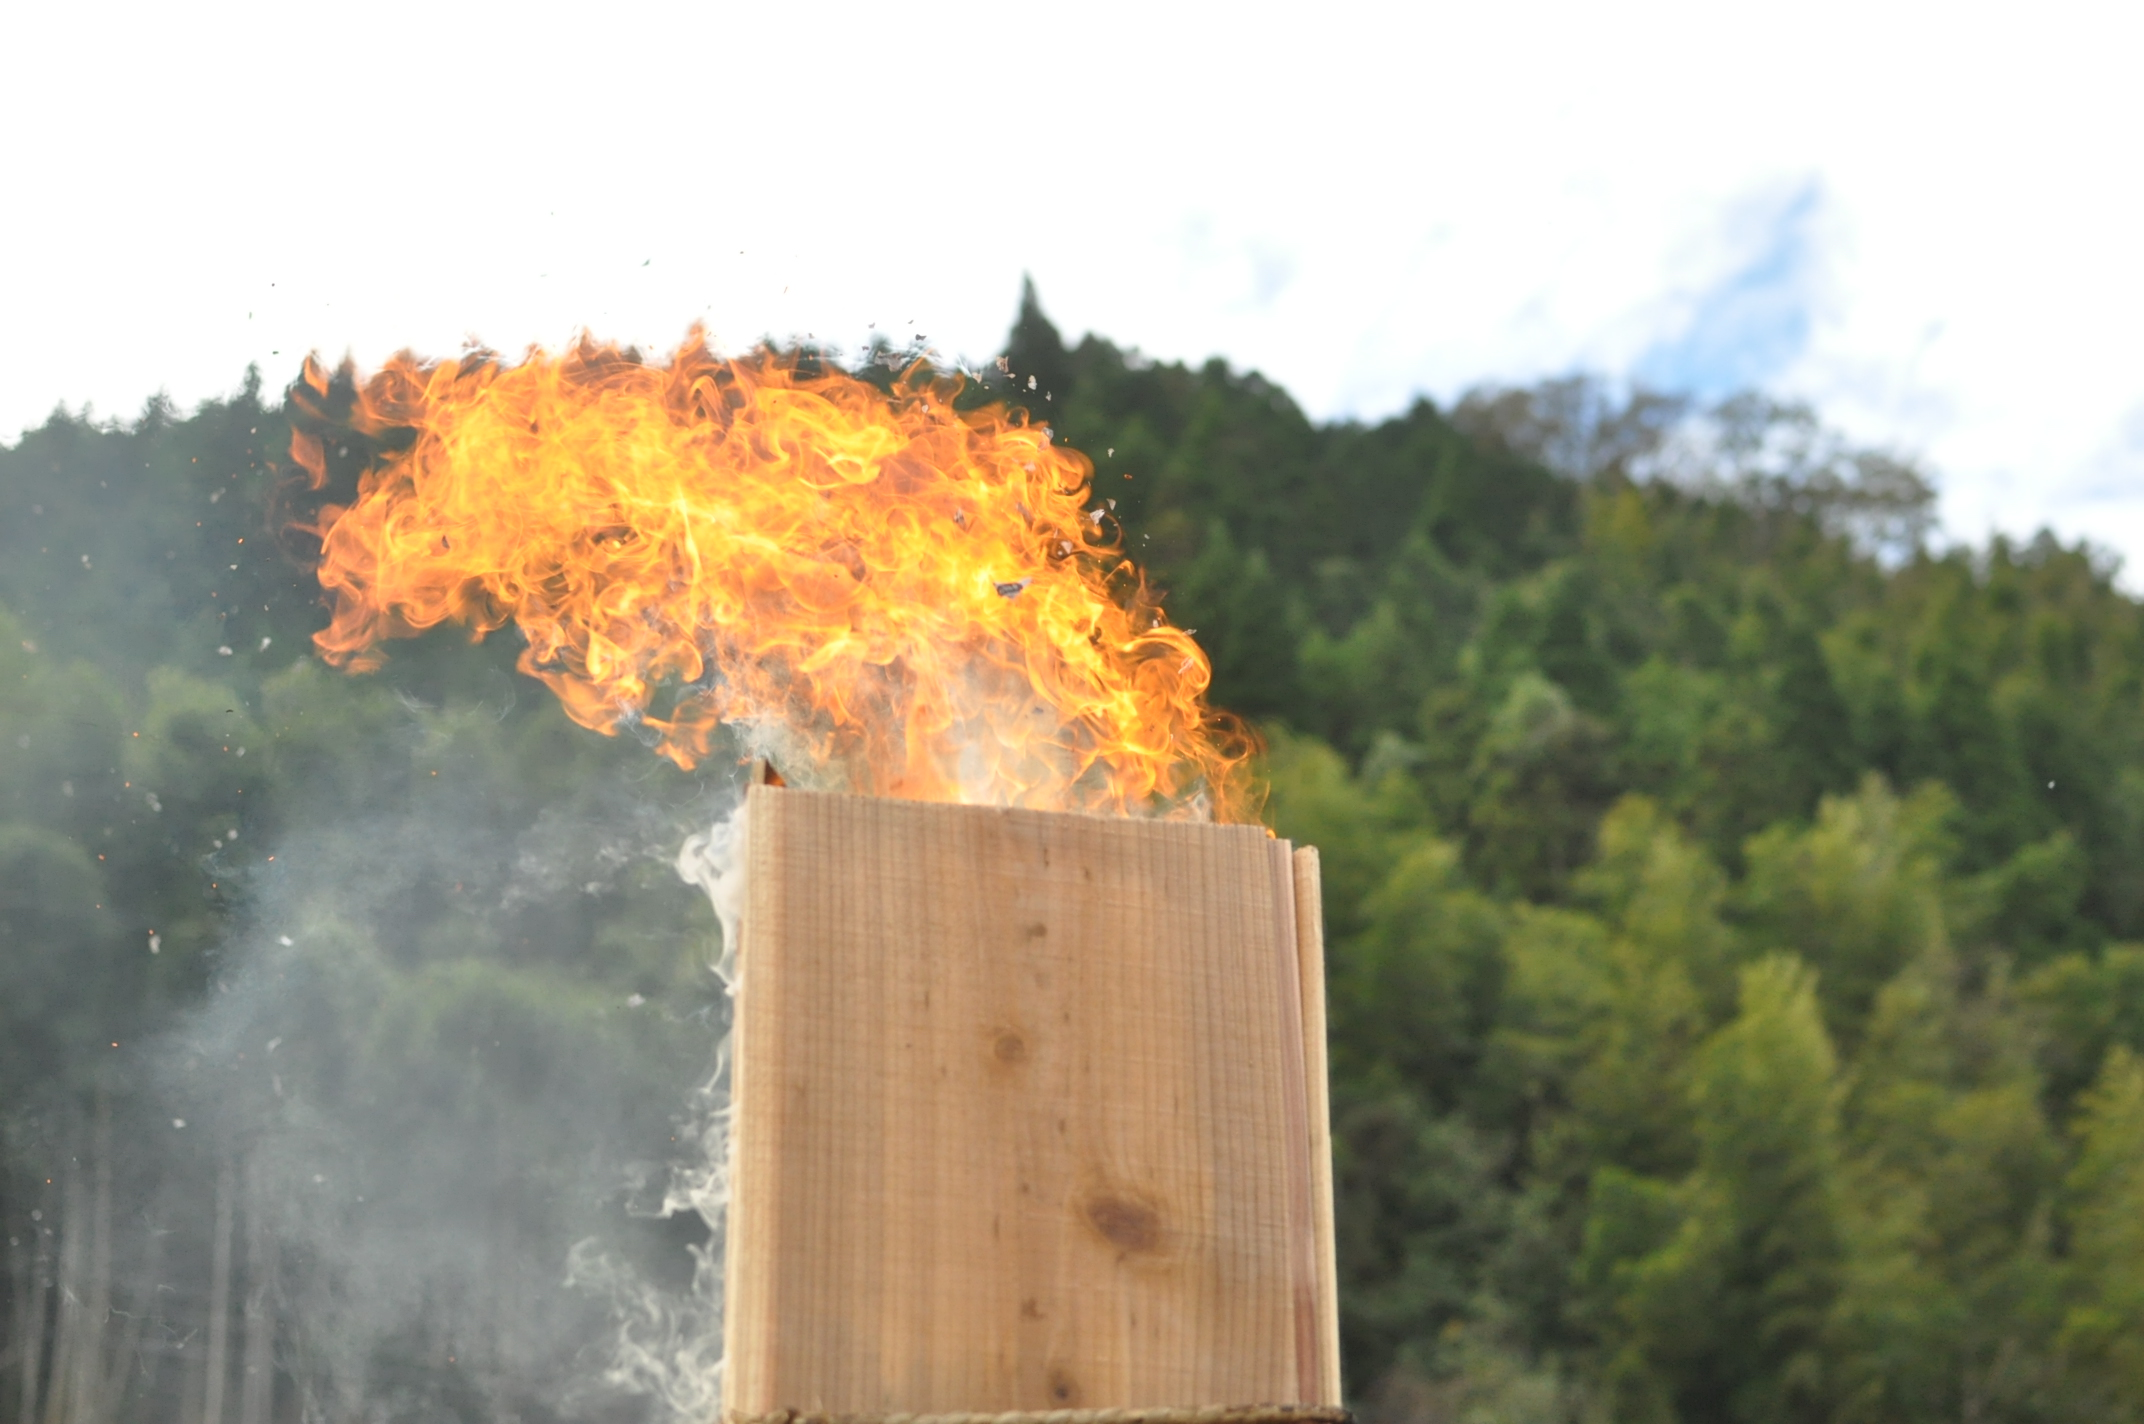 築200年の古民家、焼杉板を焼く!!|古民家再生DIY|火柱2